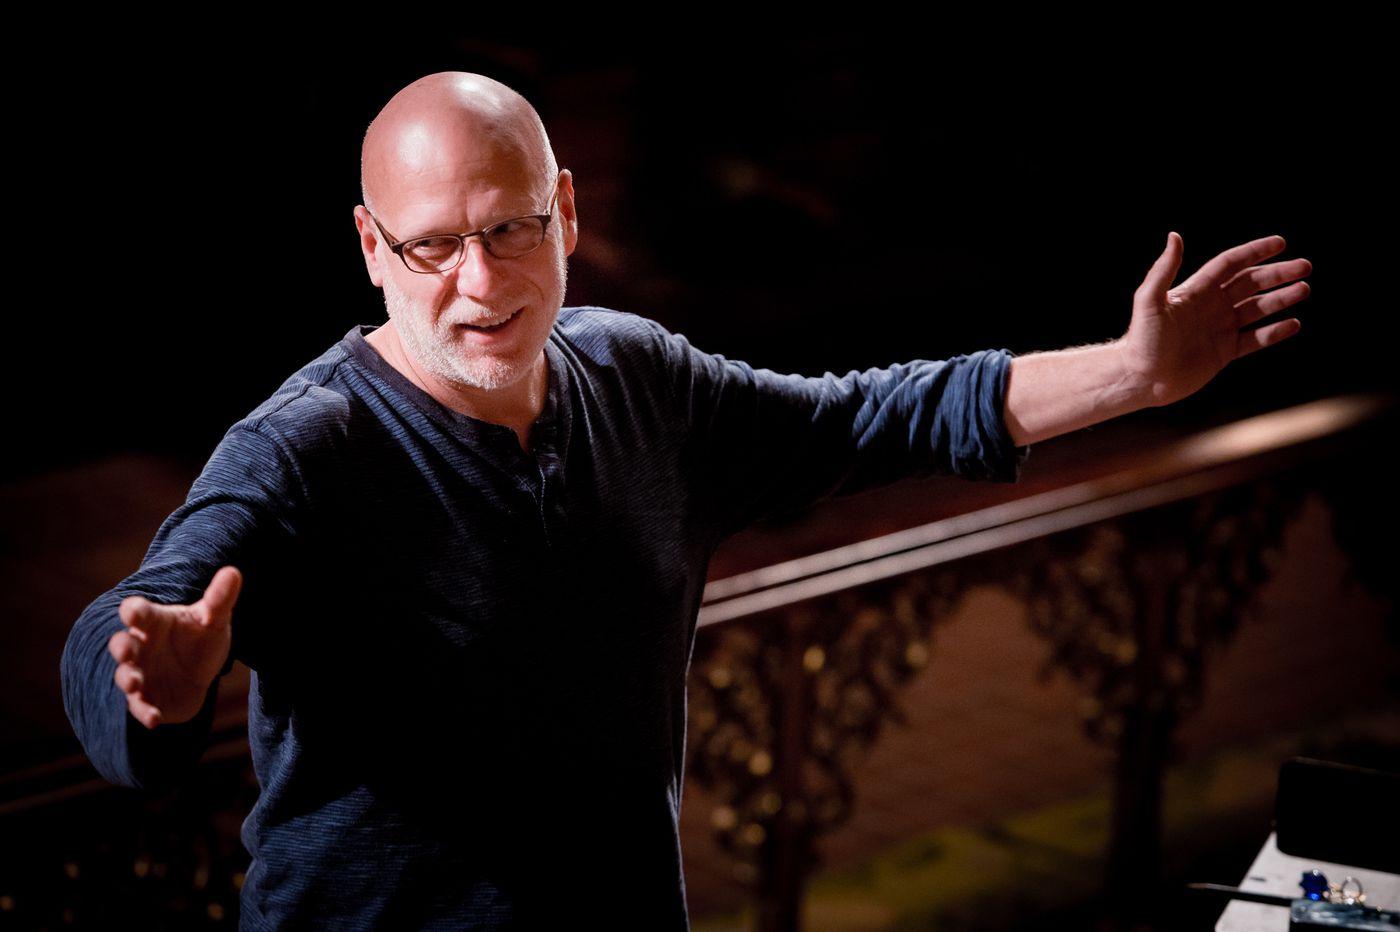 The Crossing choir premieres vivid new Kile Smith work